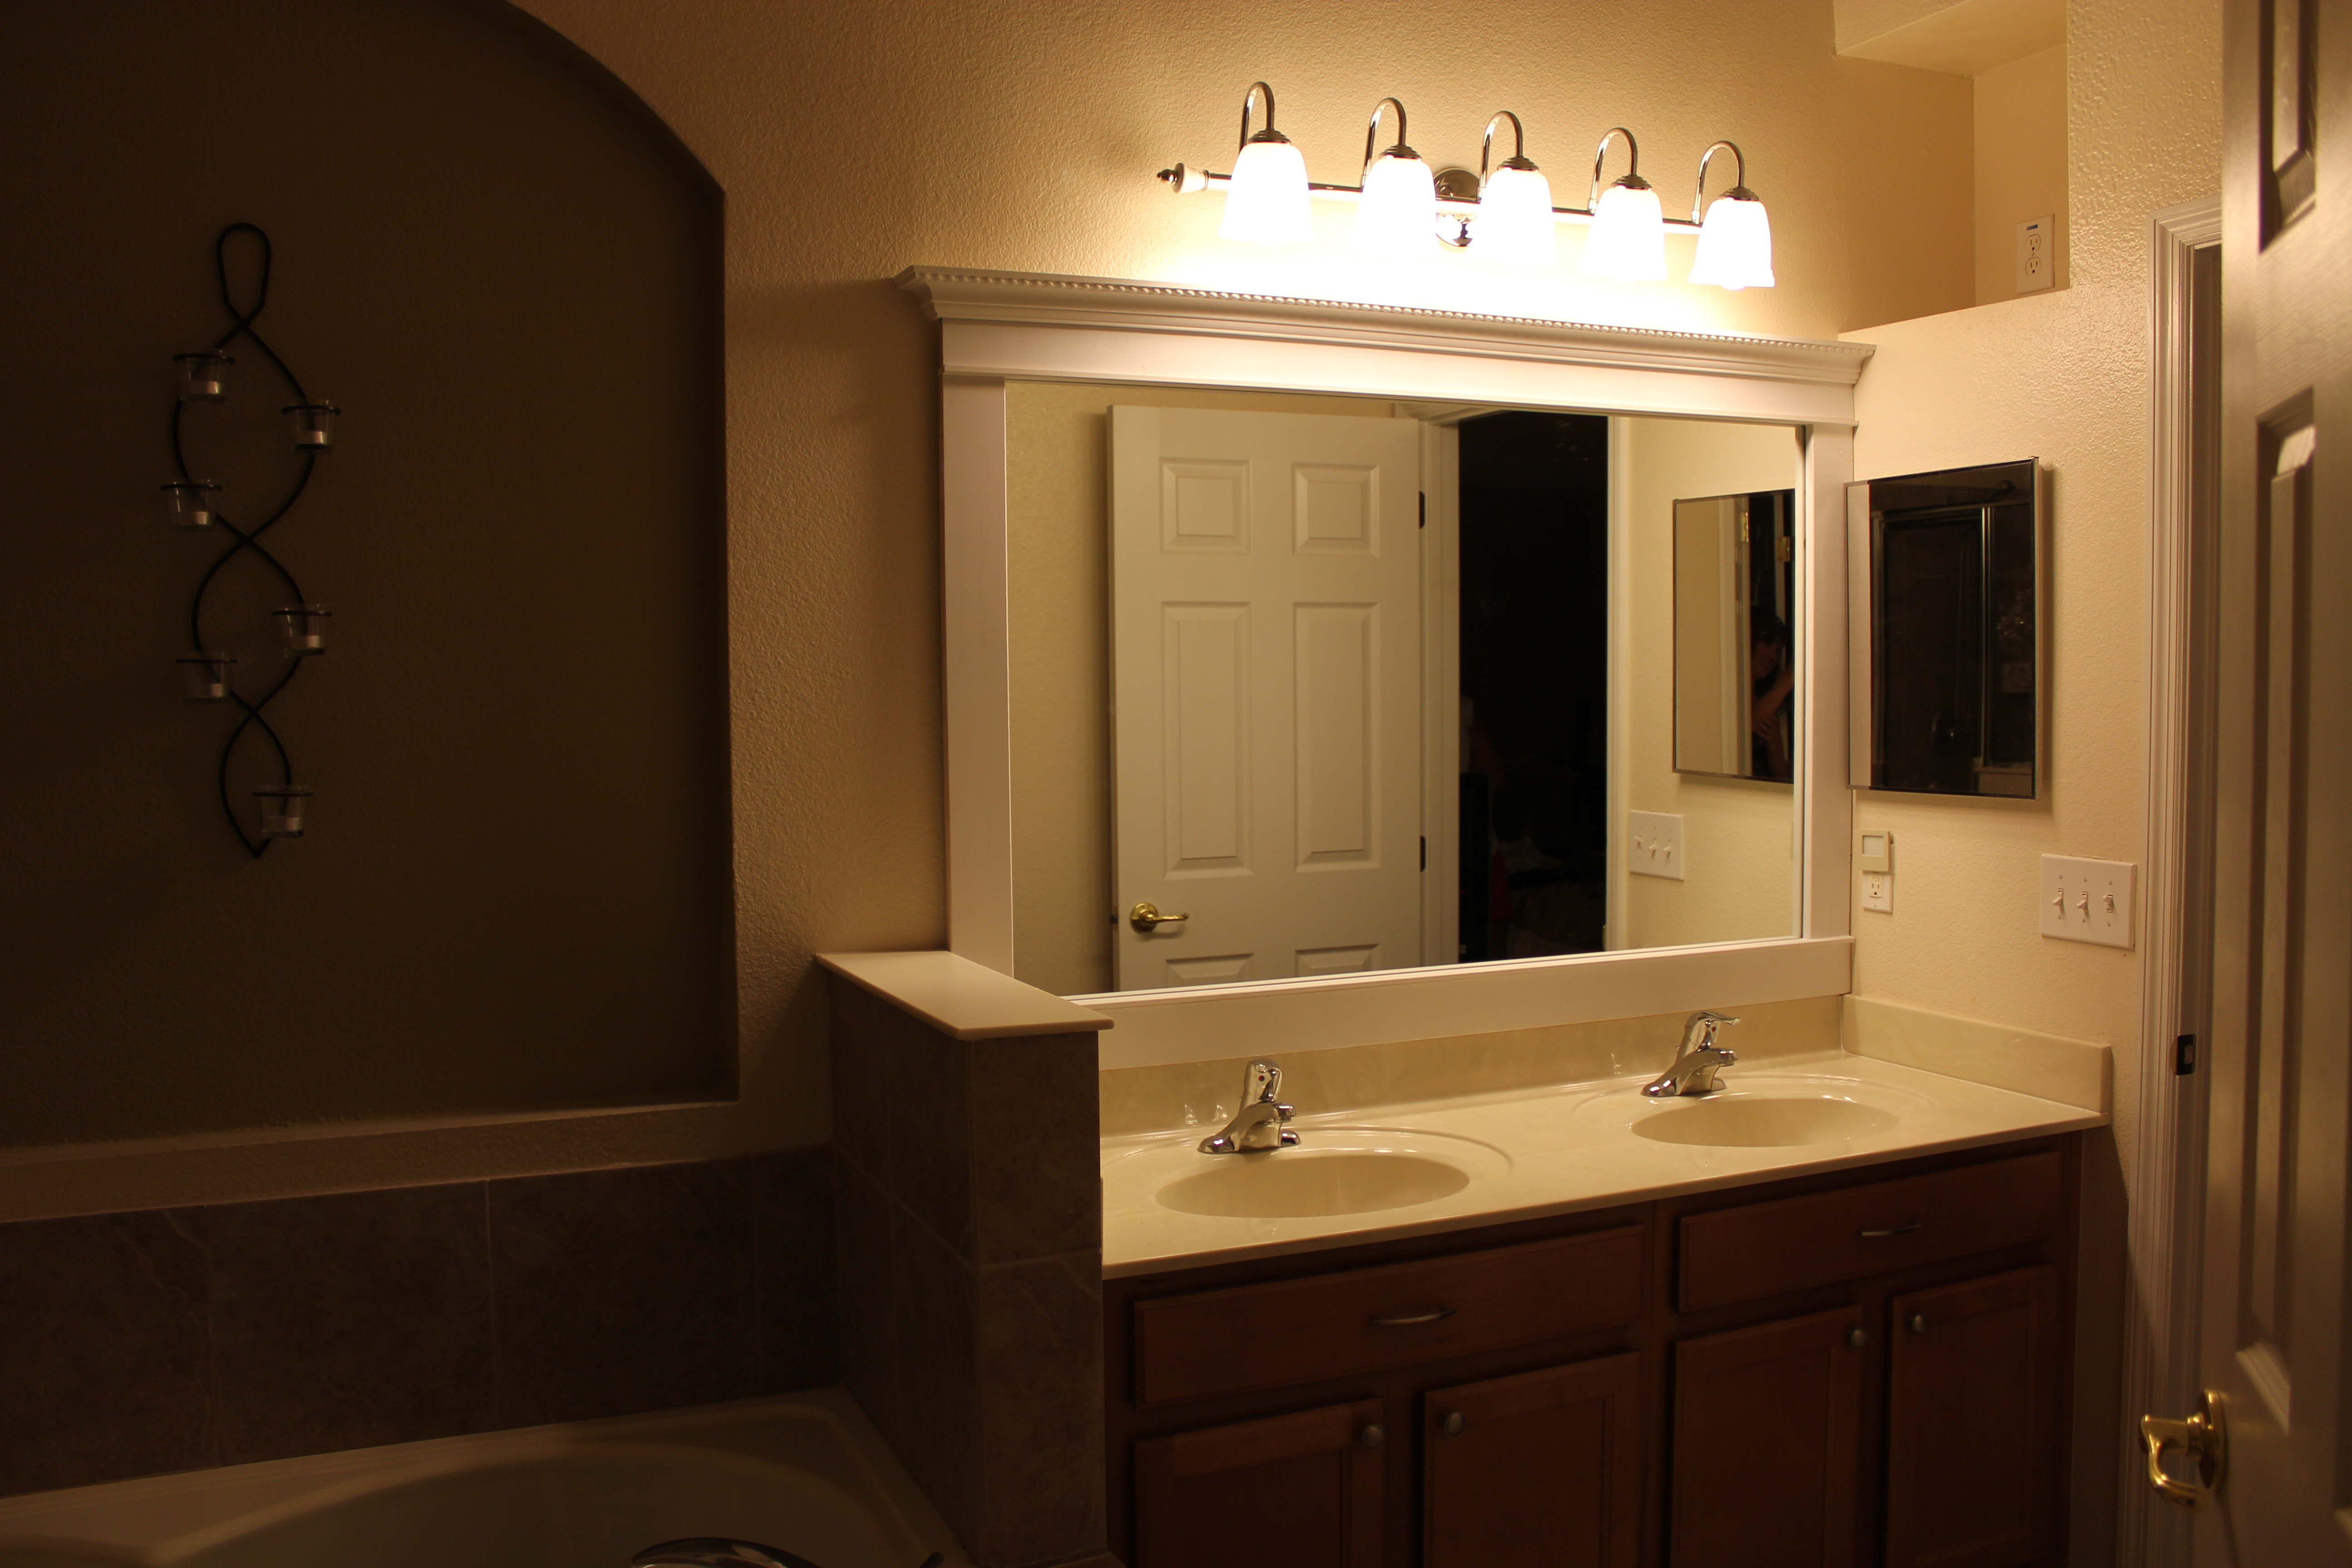 beautiful diy bathroom mirror picture-Best Of Diy Bathroom Mirror Image